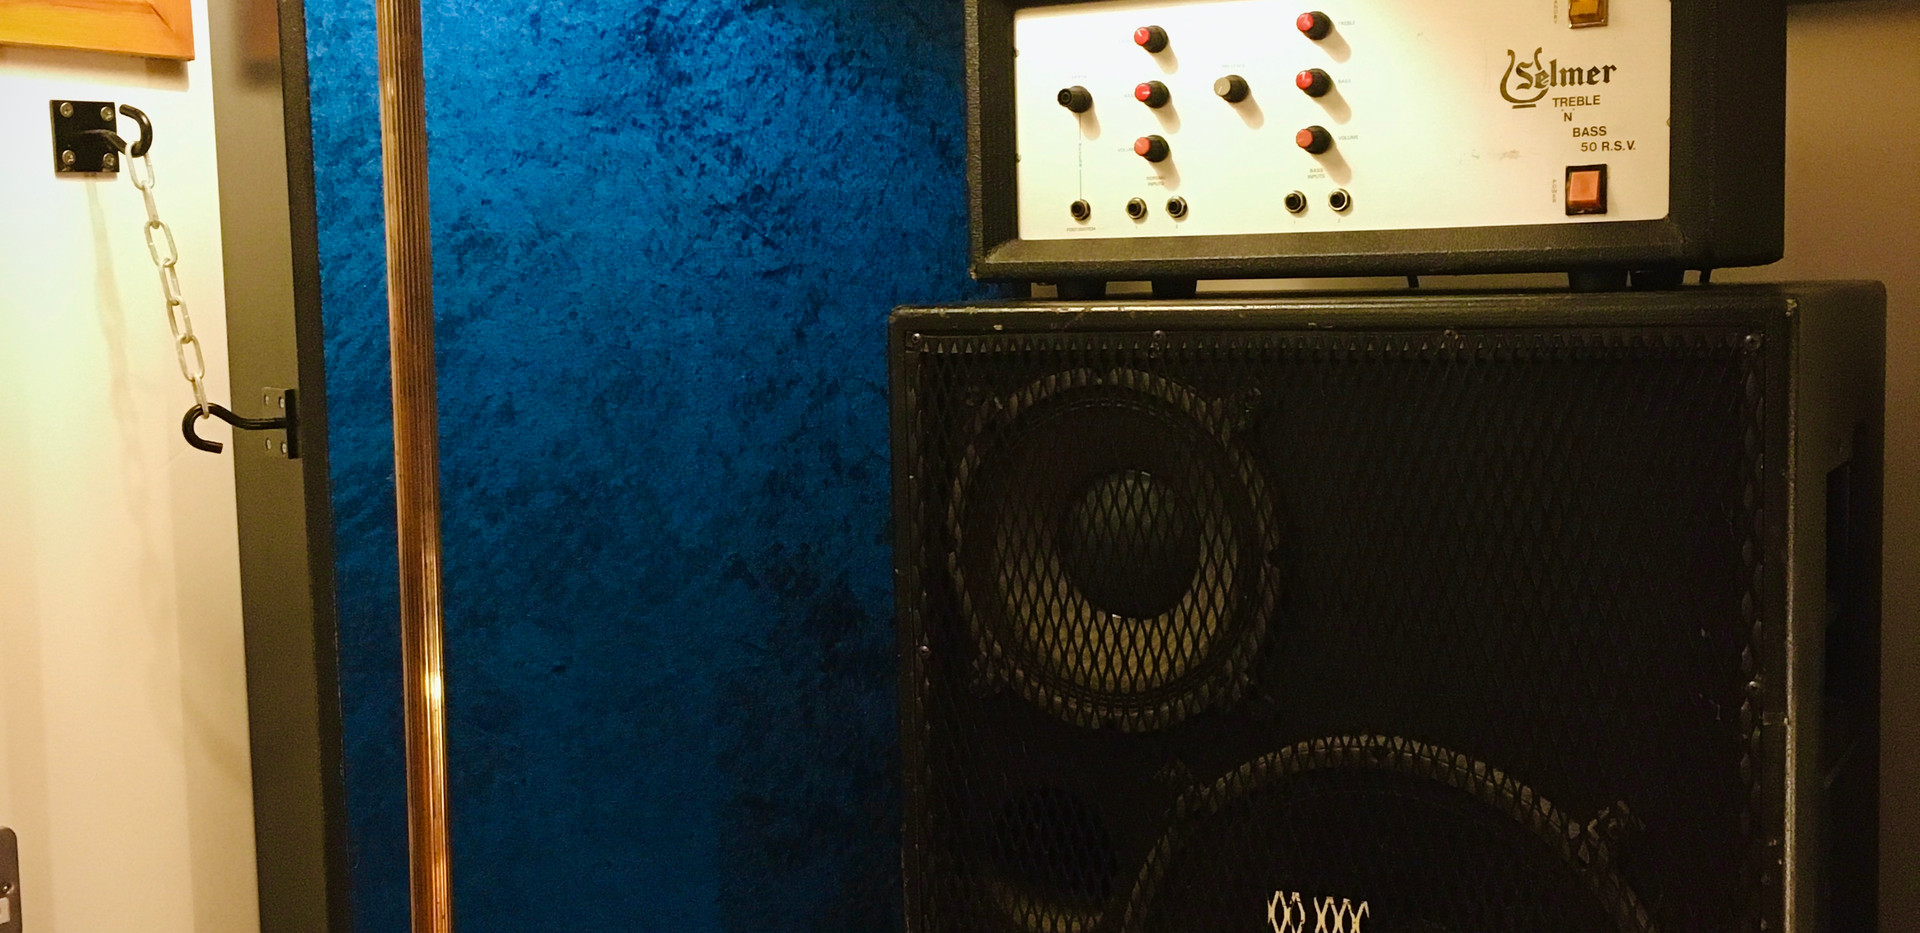 Selmer Treble n Bass 50RSV